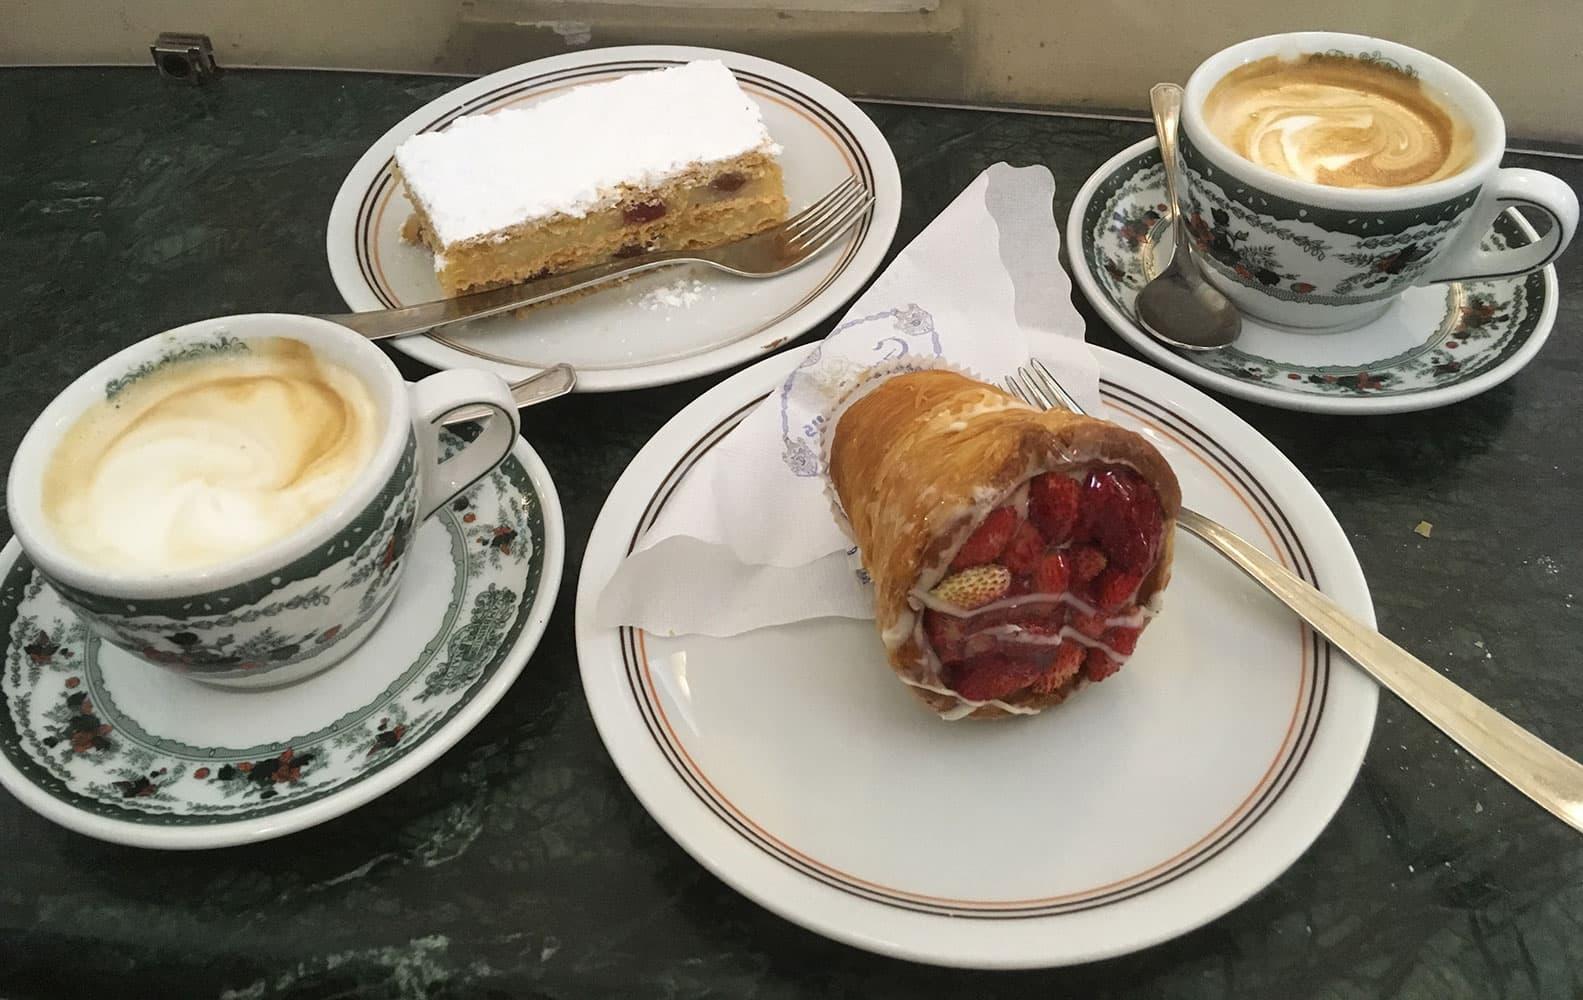 Cappuccini and pastries at Gran Caffé Gambrinus